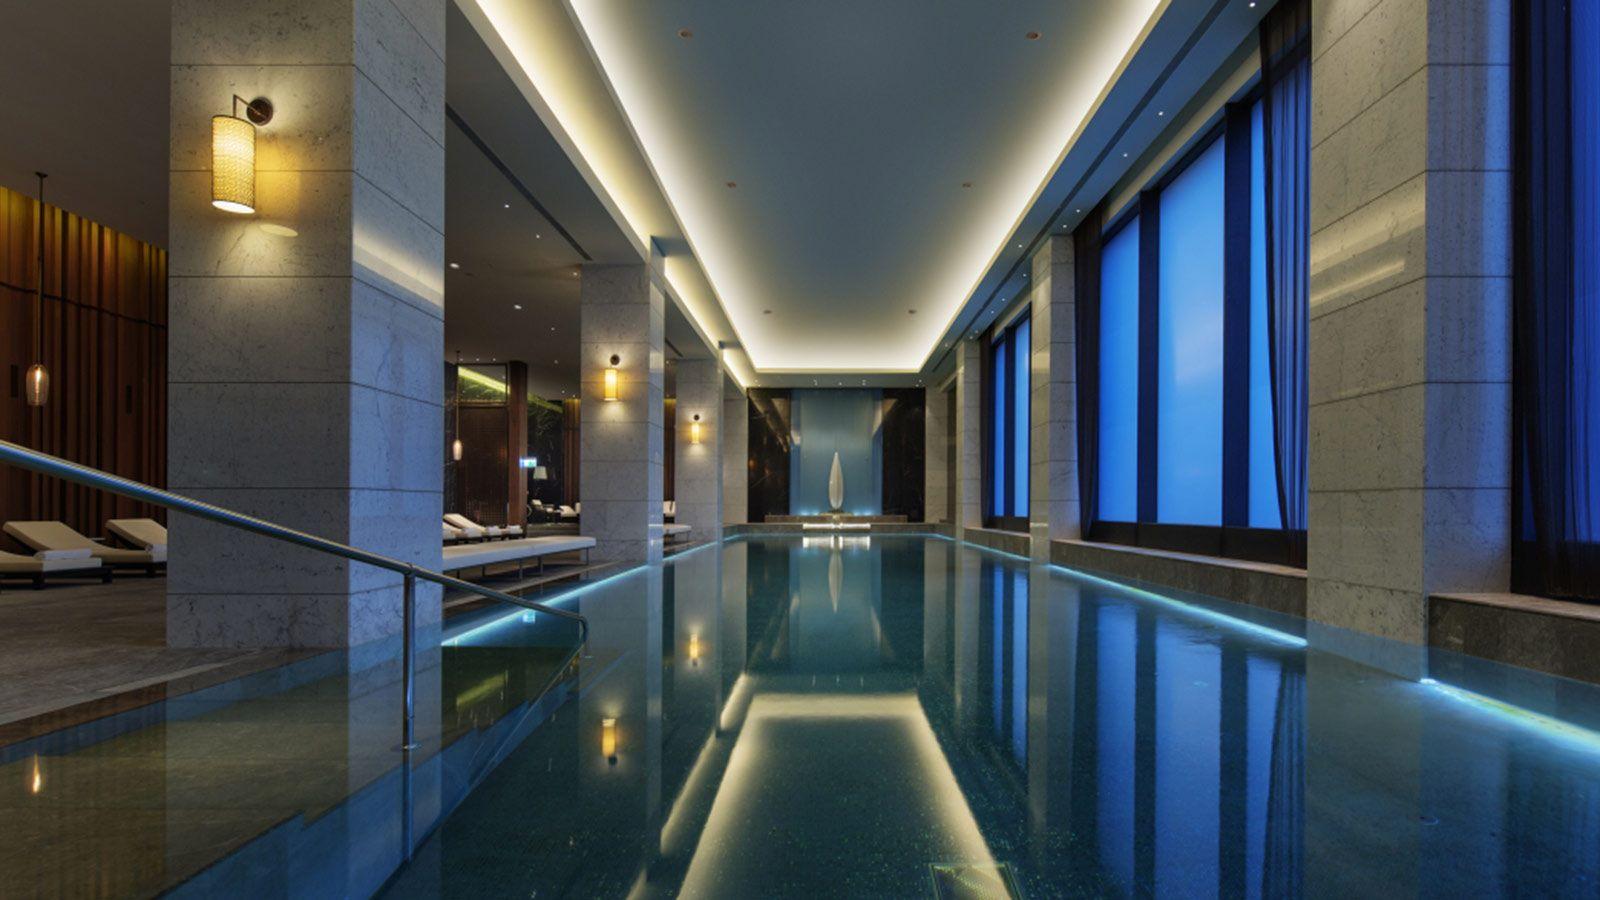 Luxury Modern Indoor Swimming Pool, Hilton Hotel - Mace Group